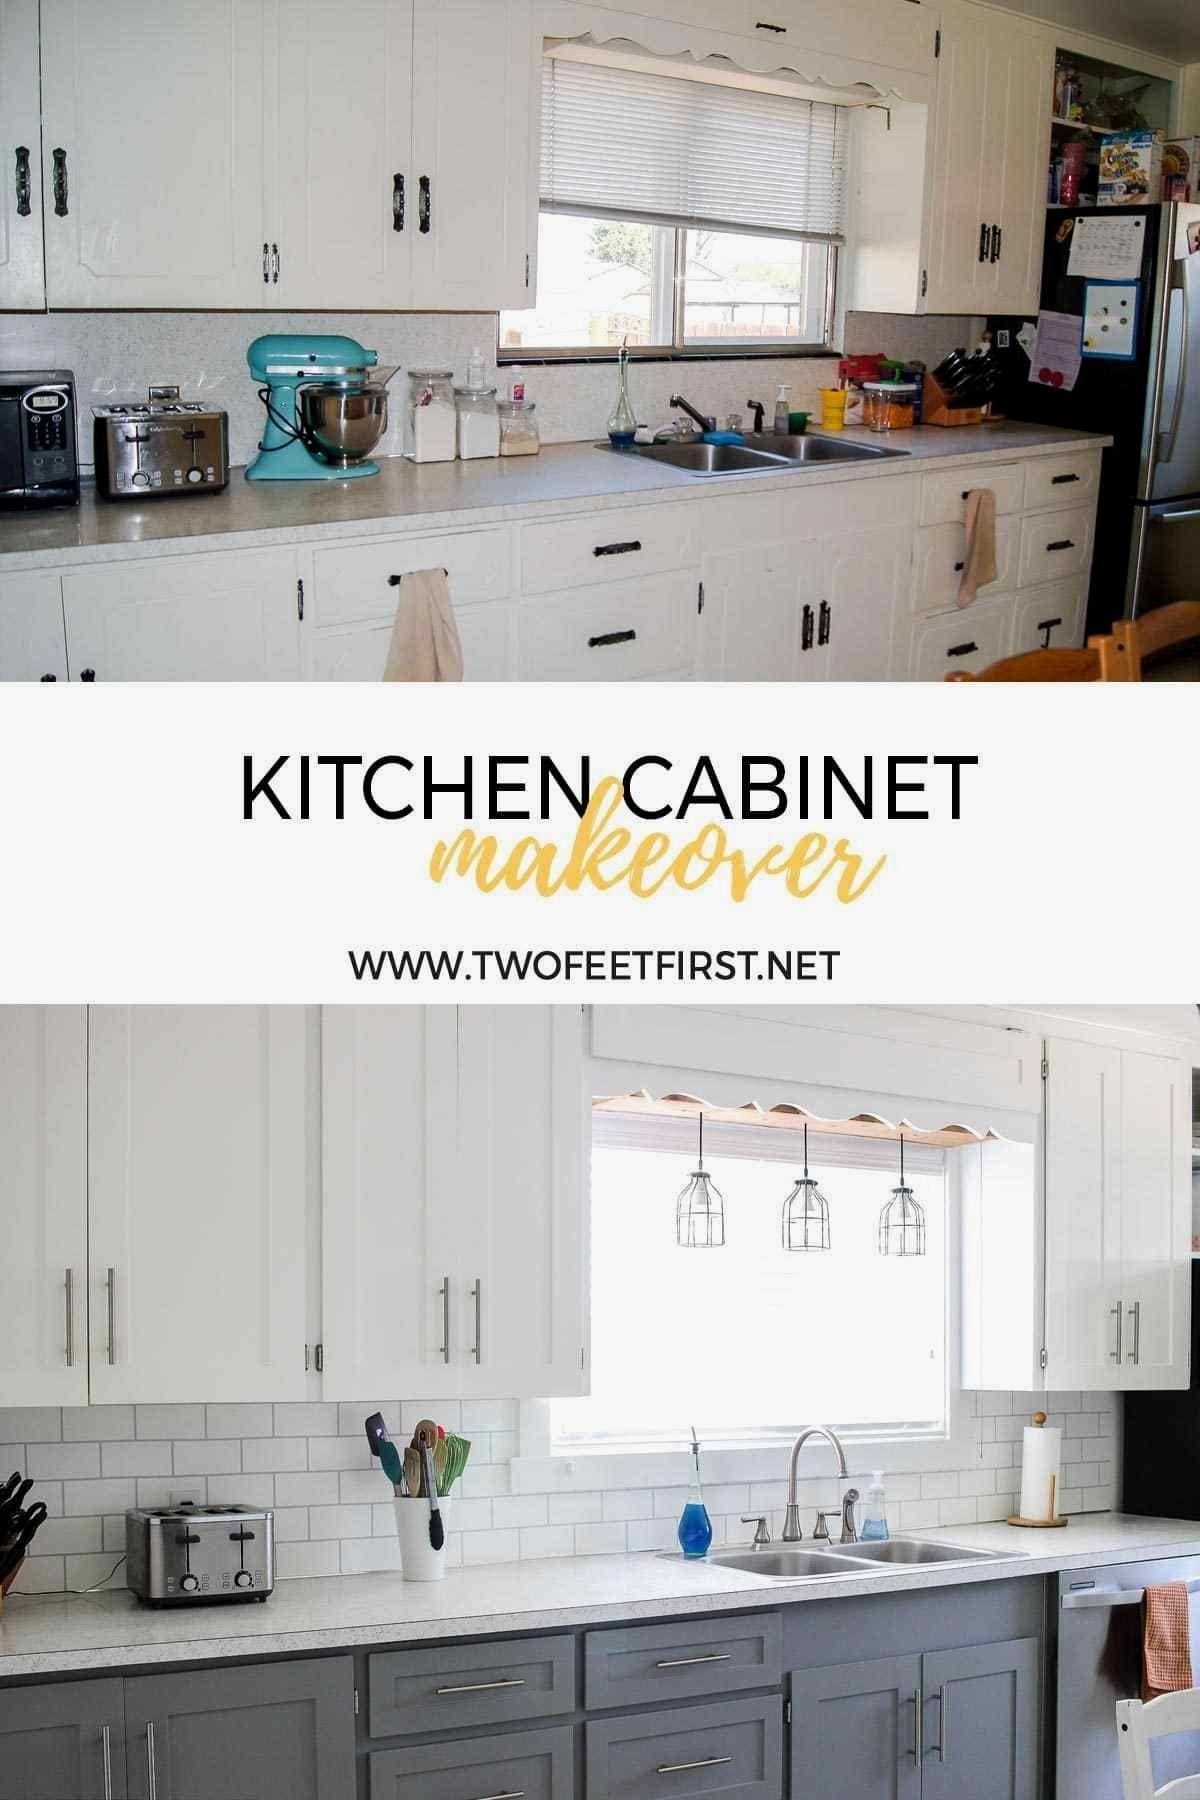 Best Diy Kitchen Cabinets Plans Kitchencabinetsremodel In 2020 Kitchen Cabinet Plans Kitchen Cabinets Makeover Kitchen Cabinets